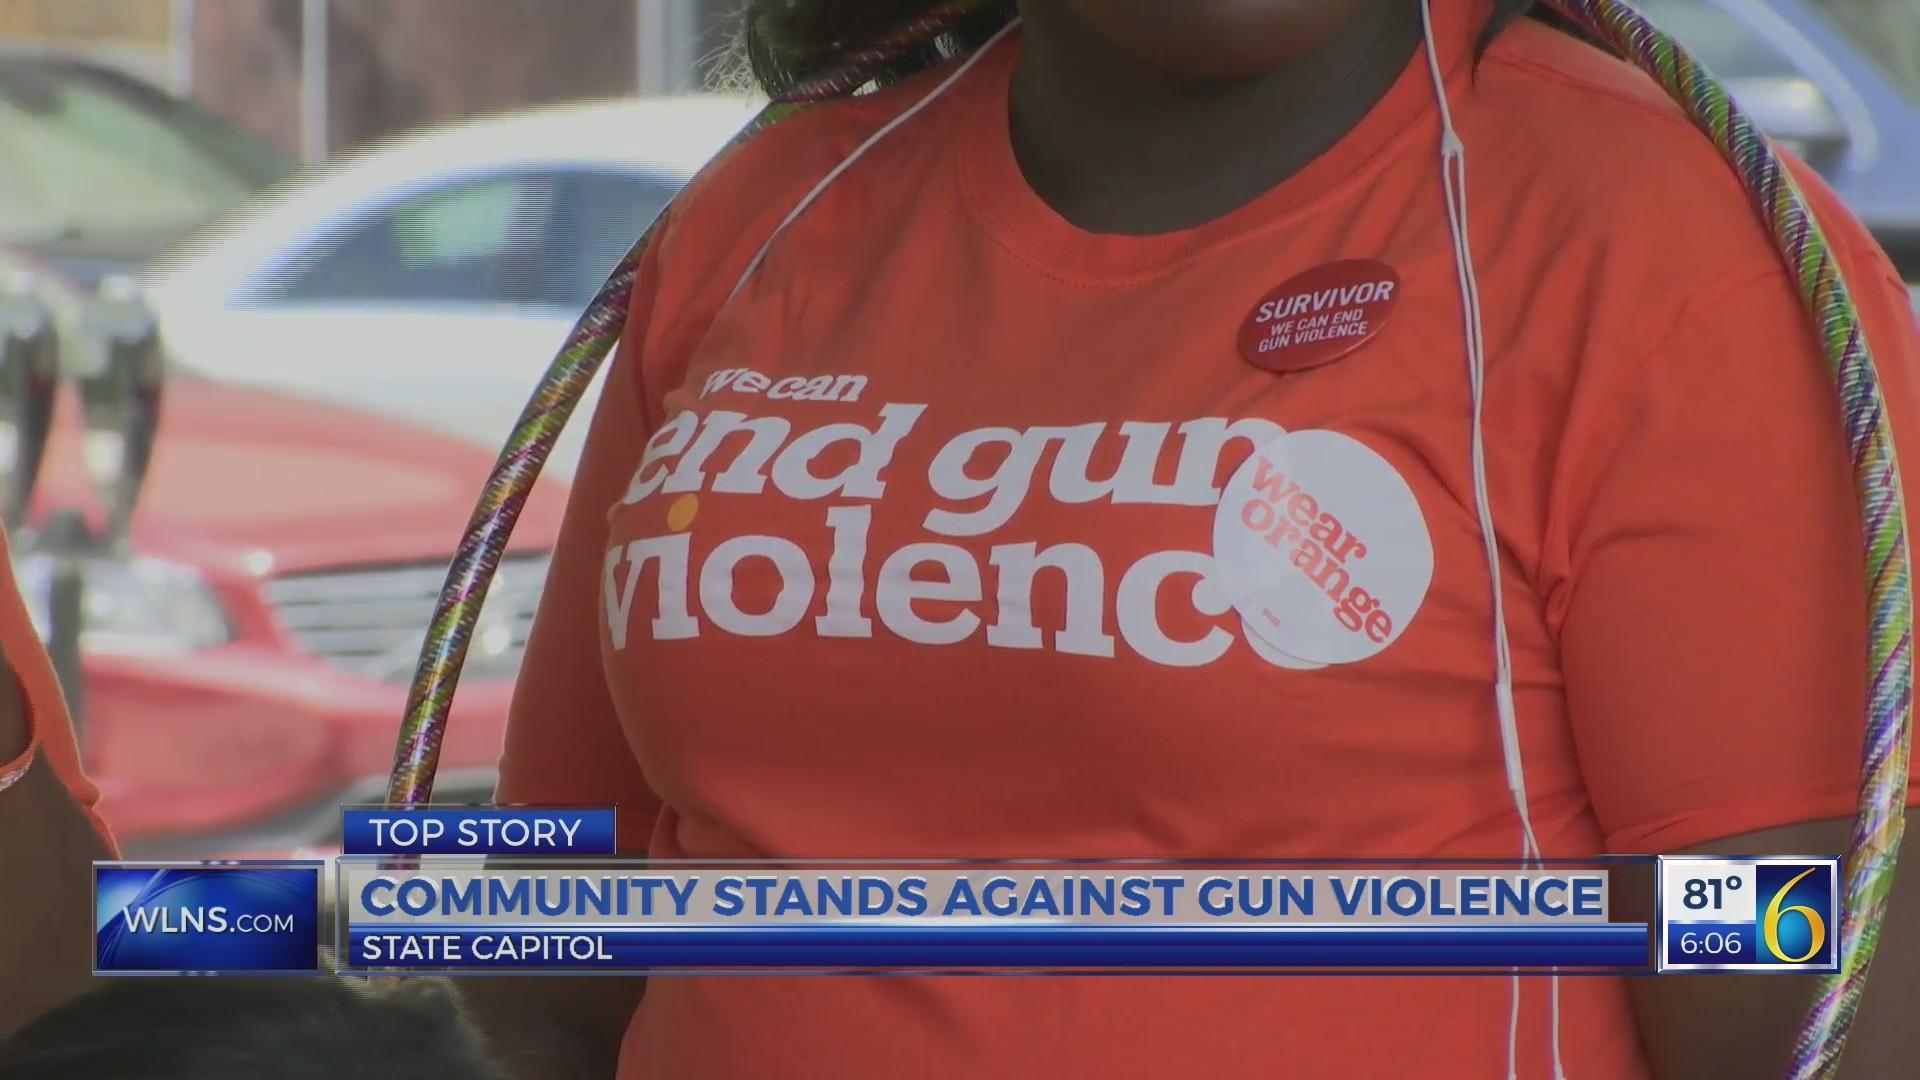 Community stands against gun violence